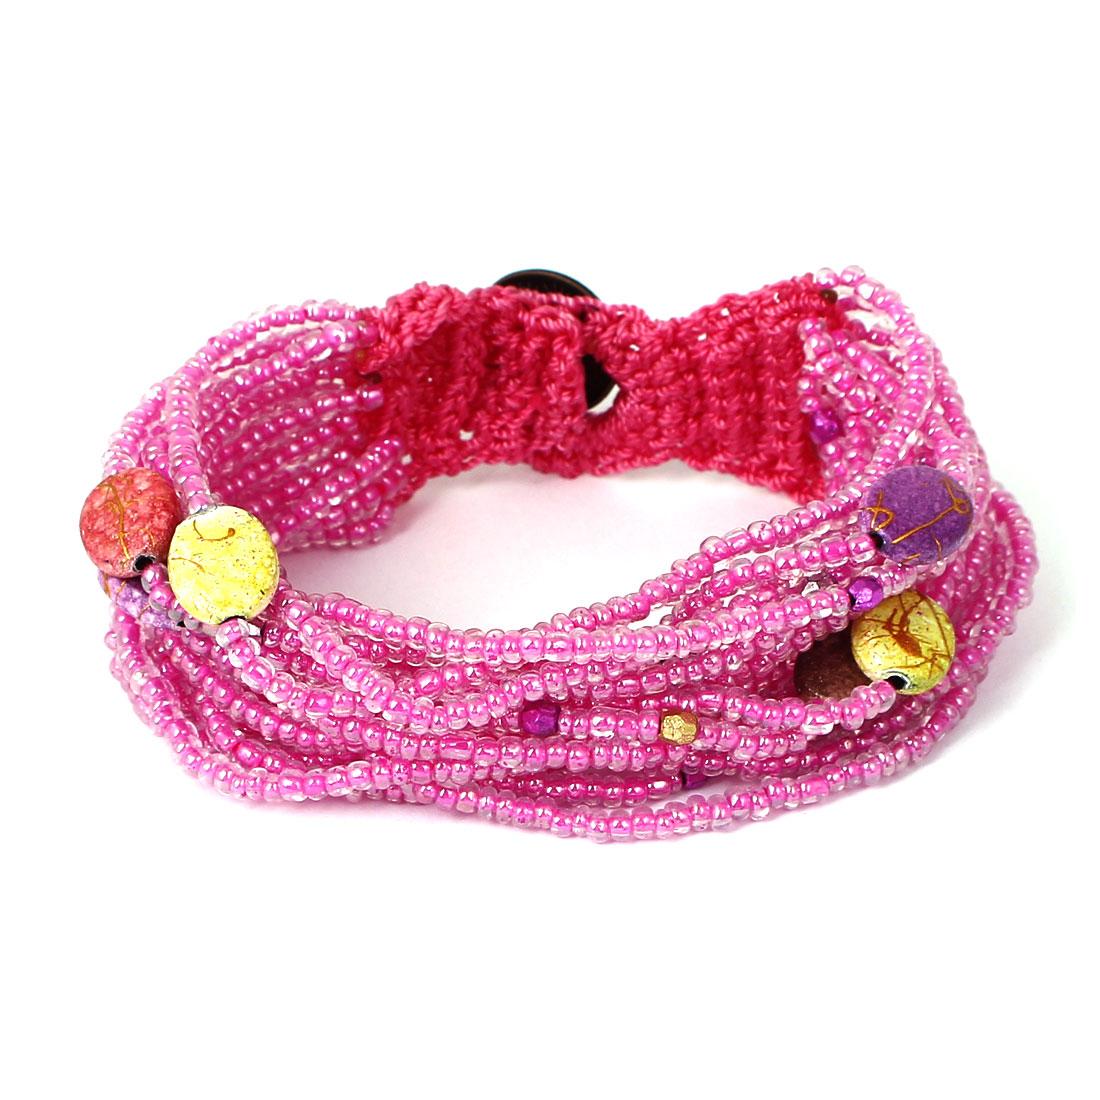 Women Button Closure Bead Chain Multilayer String Bangle Cuff Bracelet Fuchsia